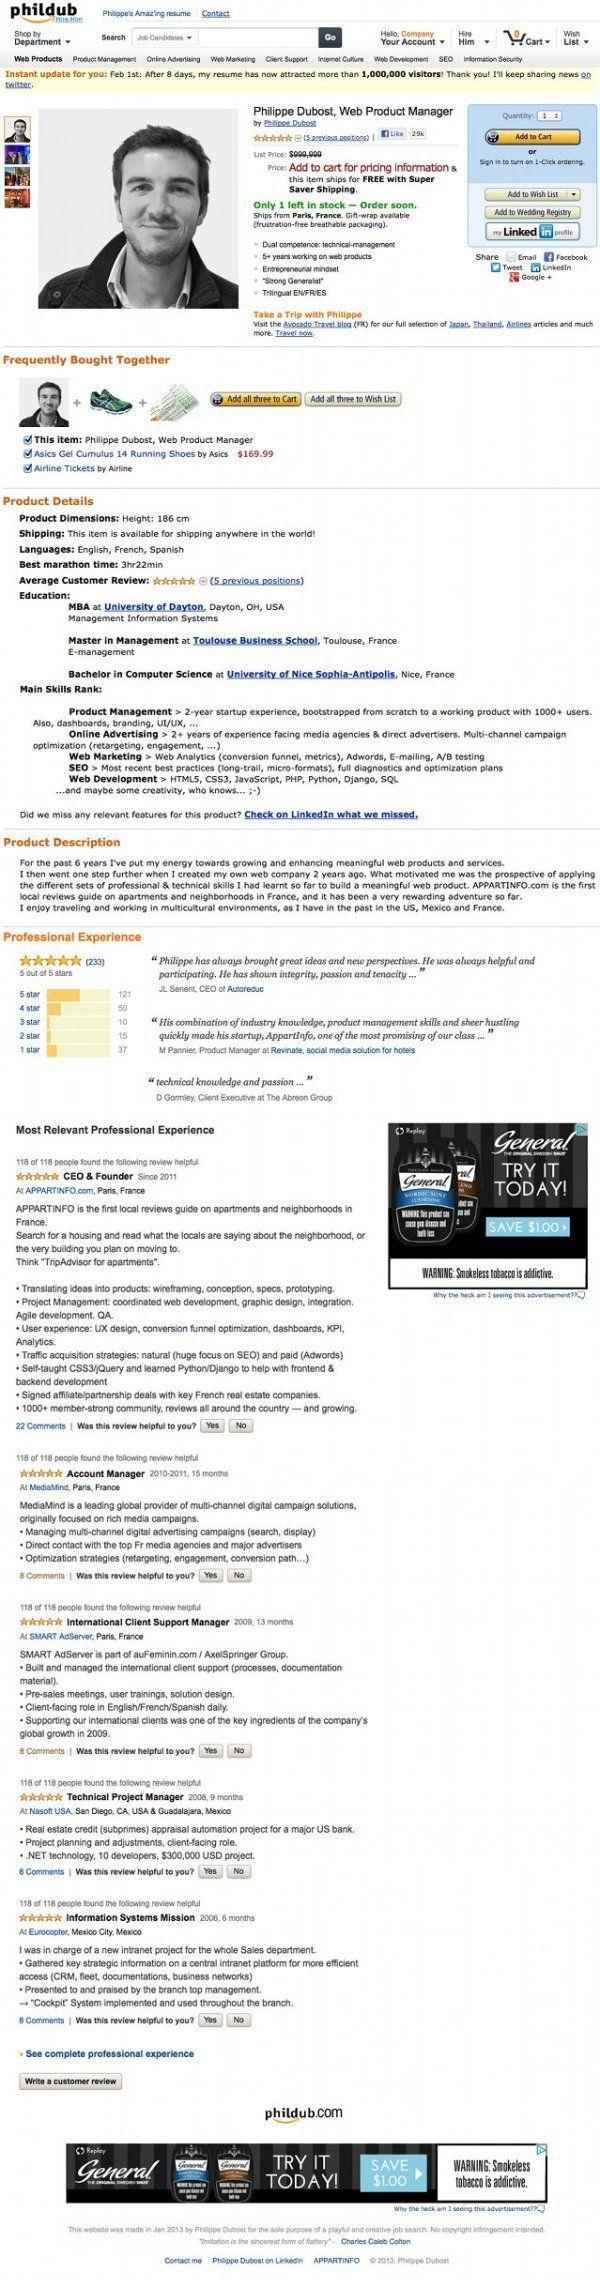 best 20 online cv ideas on pinterest online resume online cv